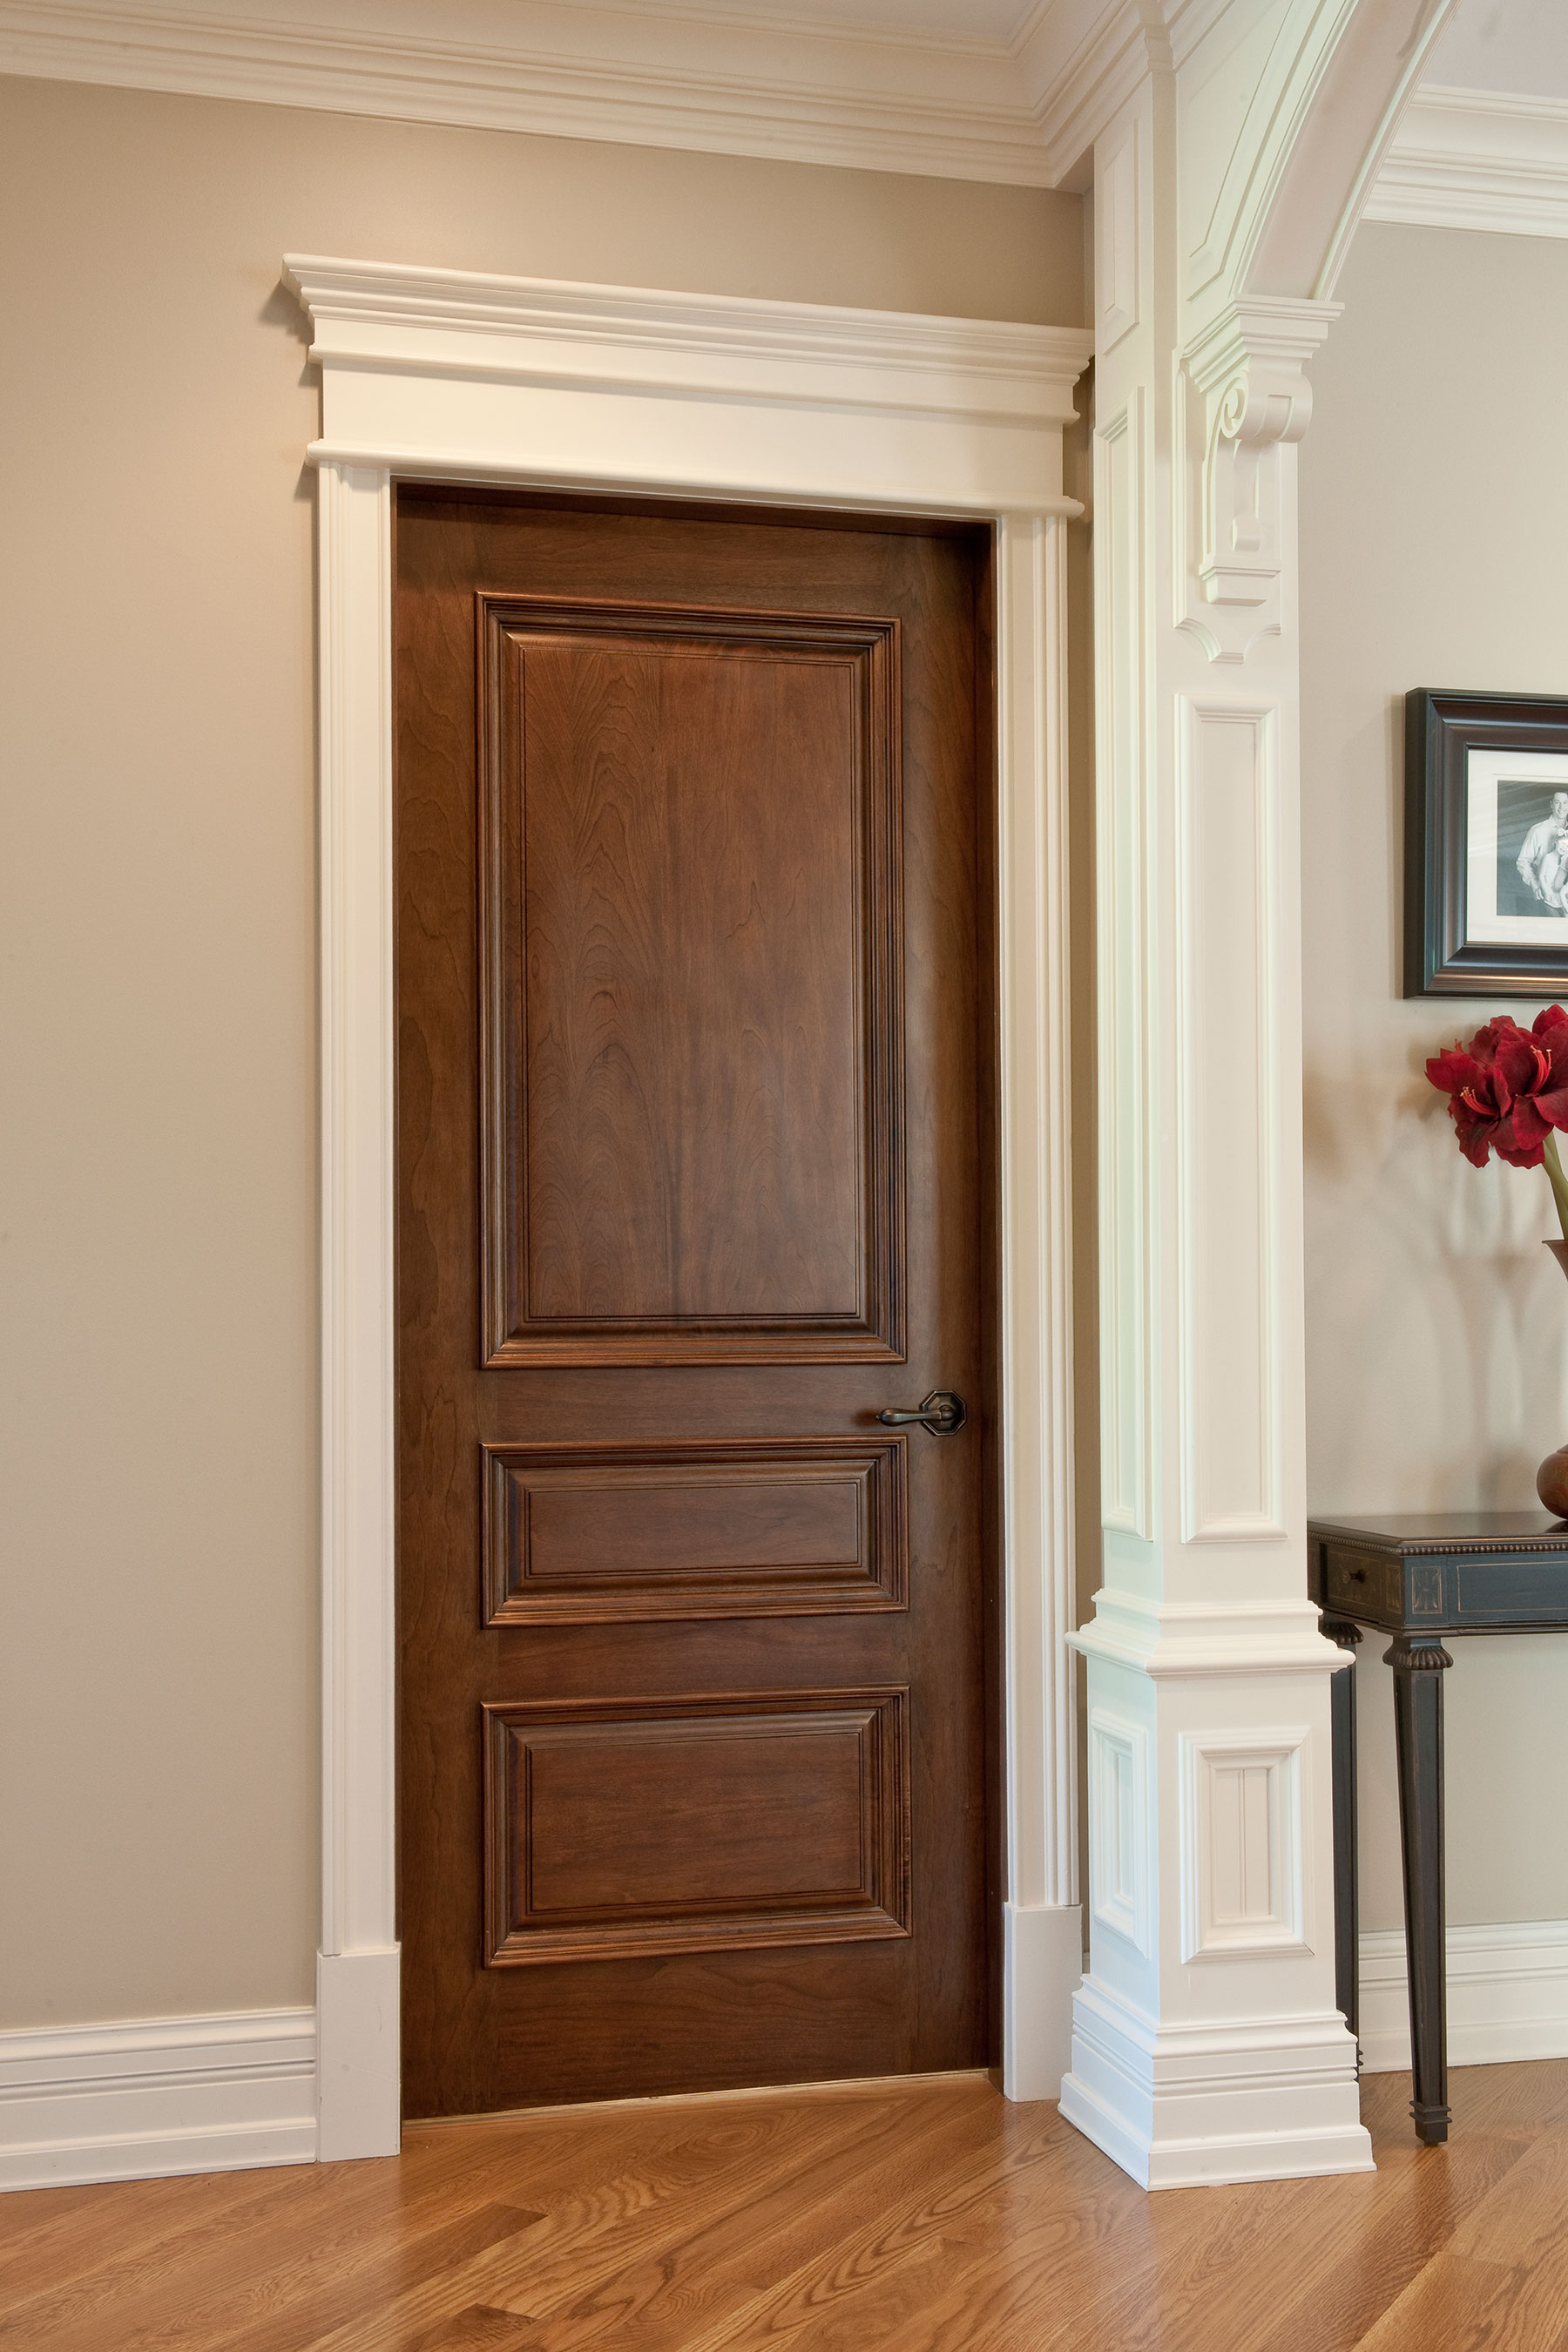 Custom Wood Interior Doors | Single Three Pane l Door with Raised Moldings DBI-611 - Glenview Doors - Custom Doors in Chicago